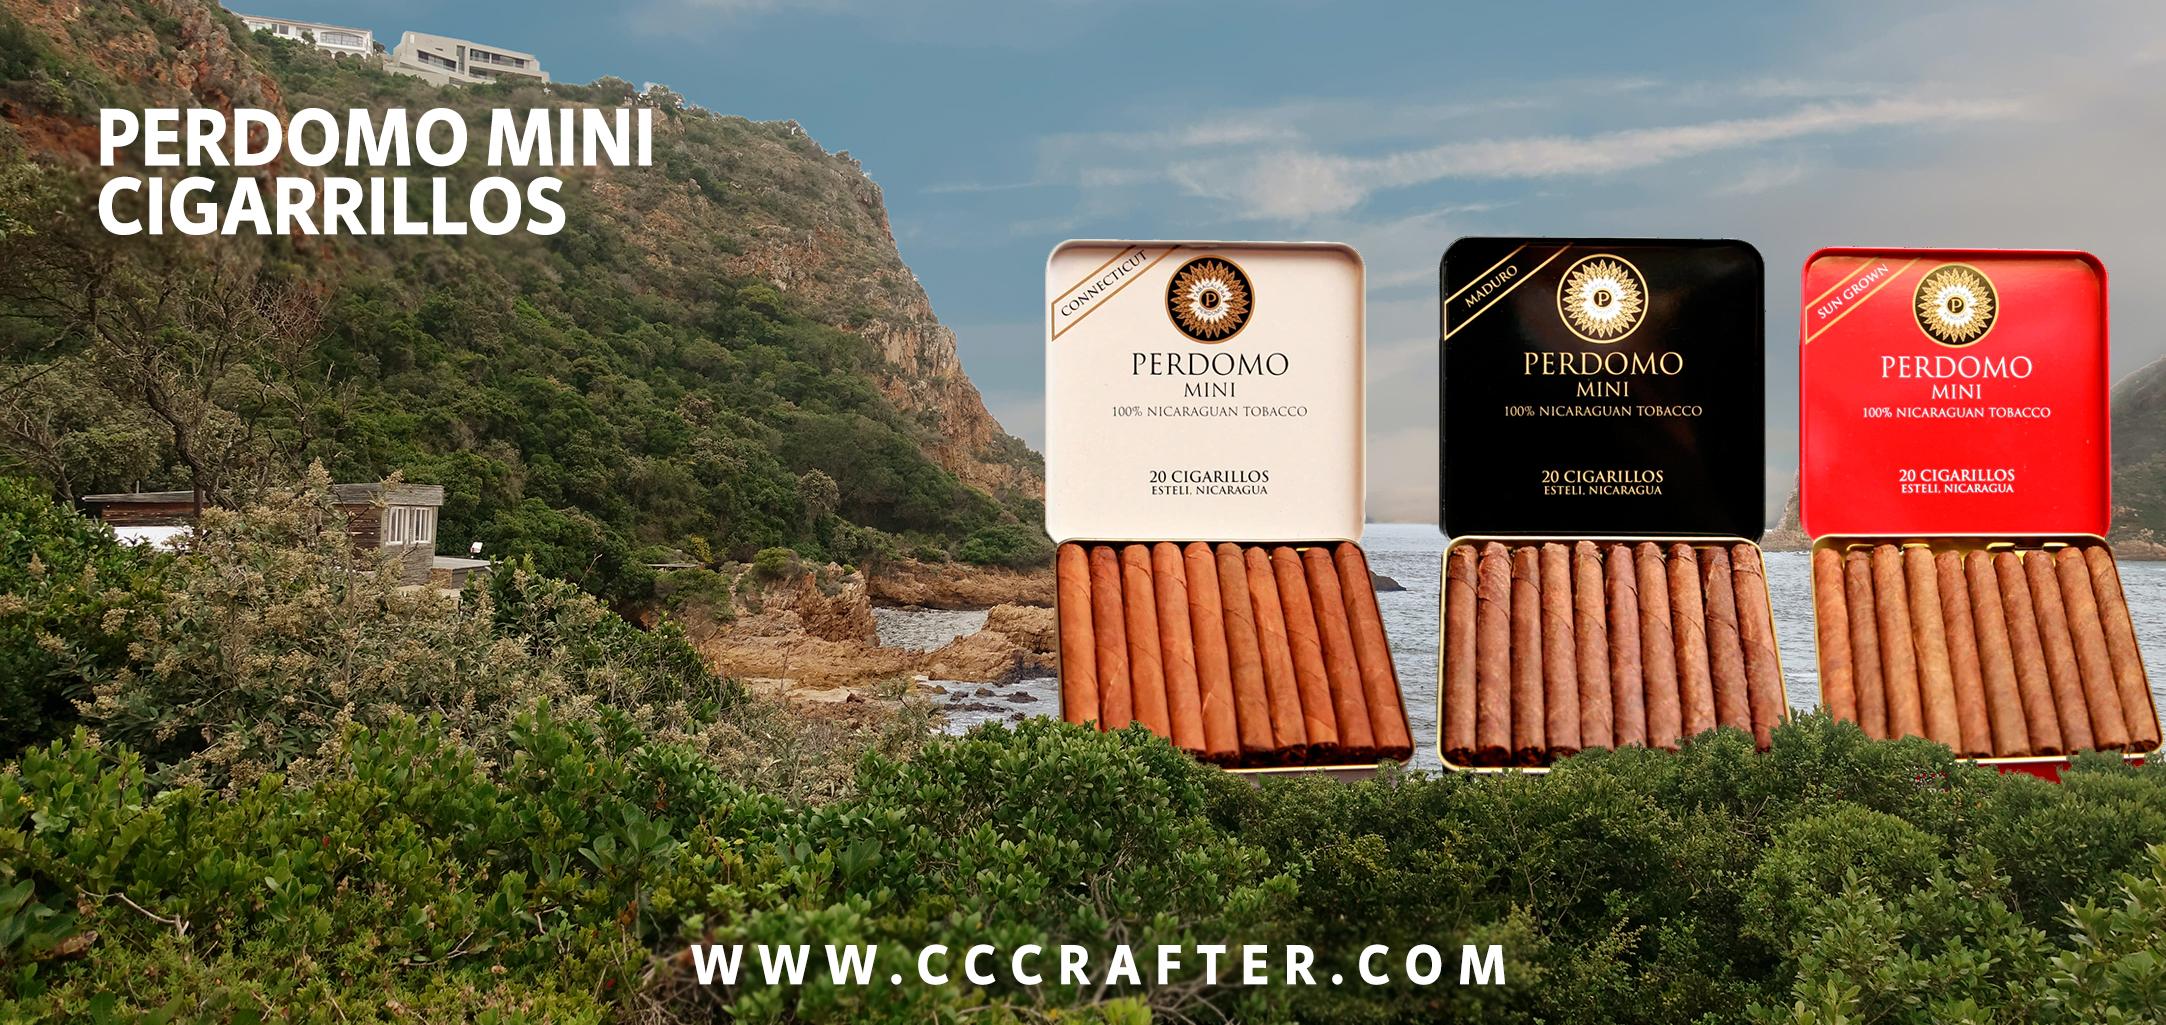 perdomo-mini-cigarrillos-banner-.jpg